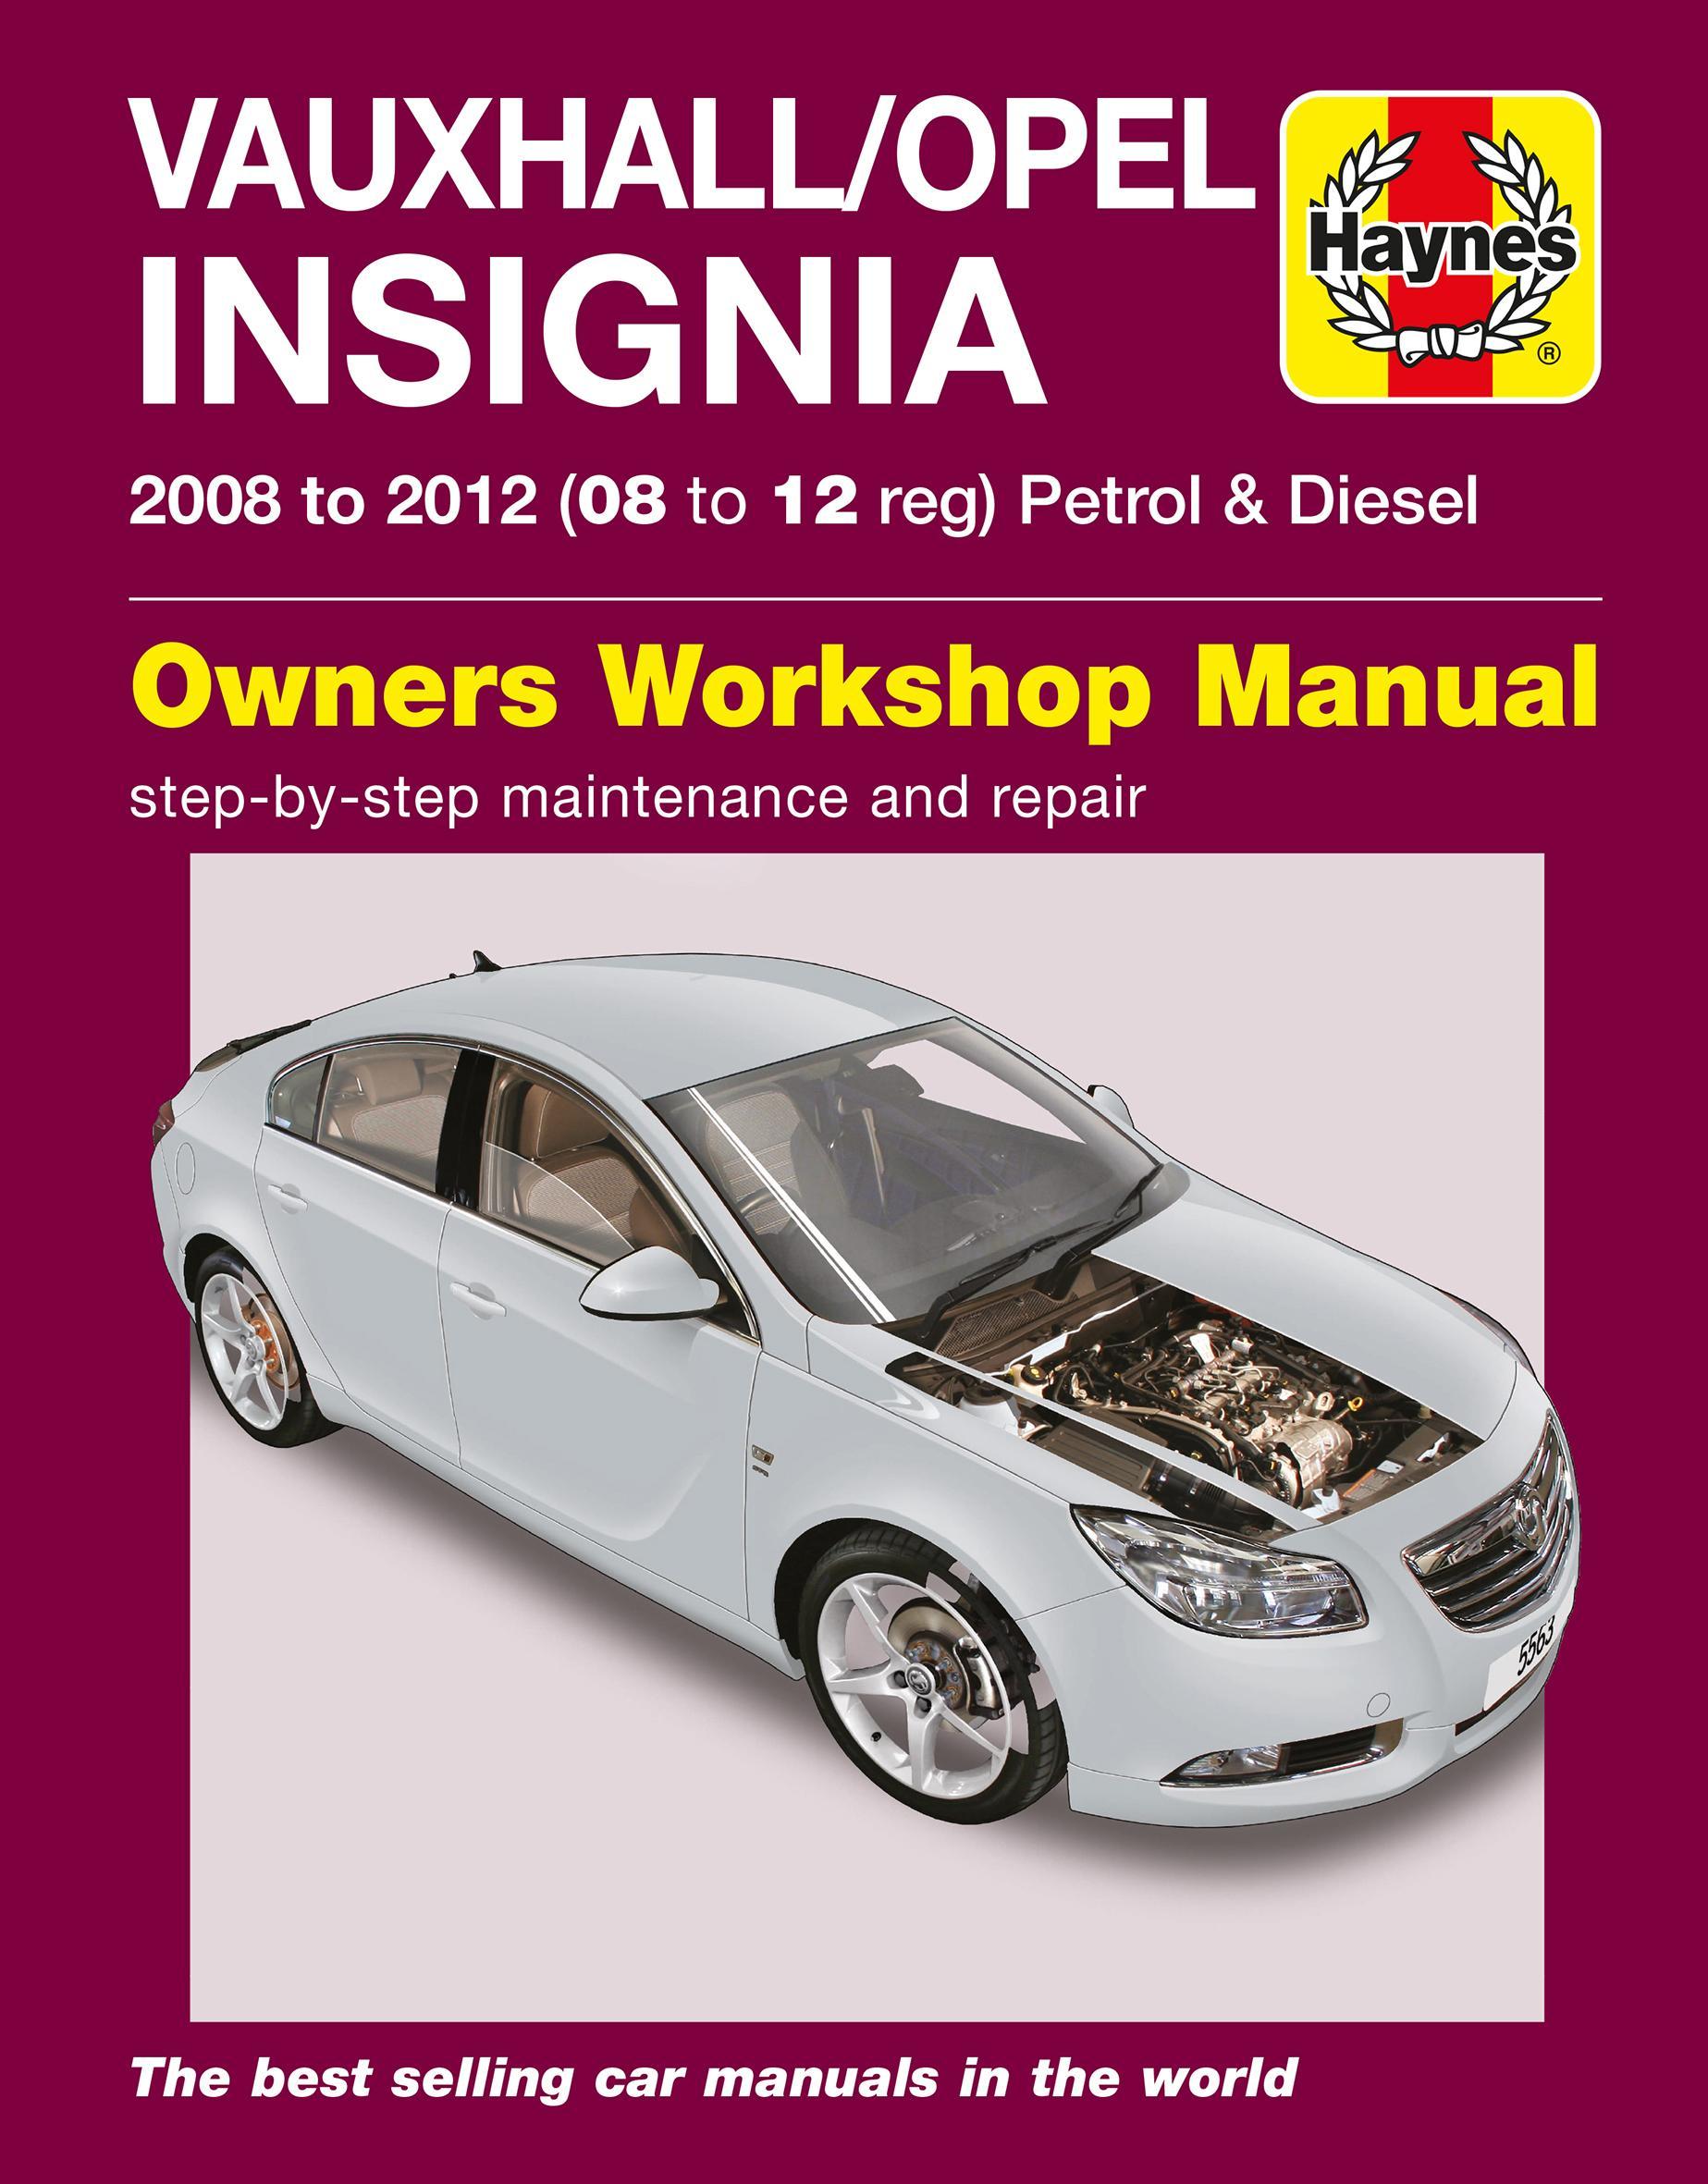 haynes vauxhall opel insignia 08 rh halfords com Opel Insignia Interior Opel Insignia Wagon